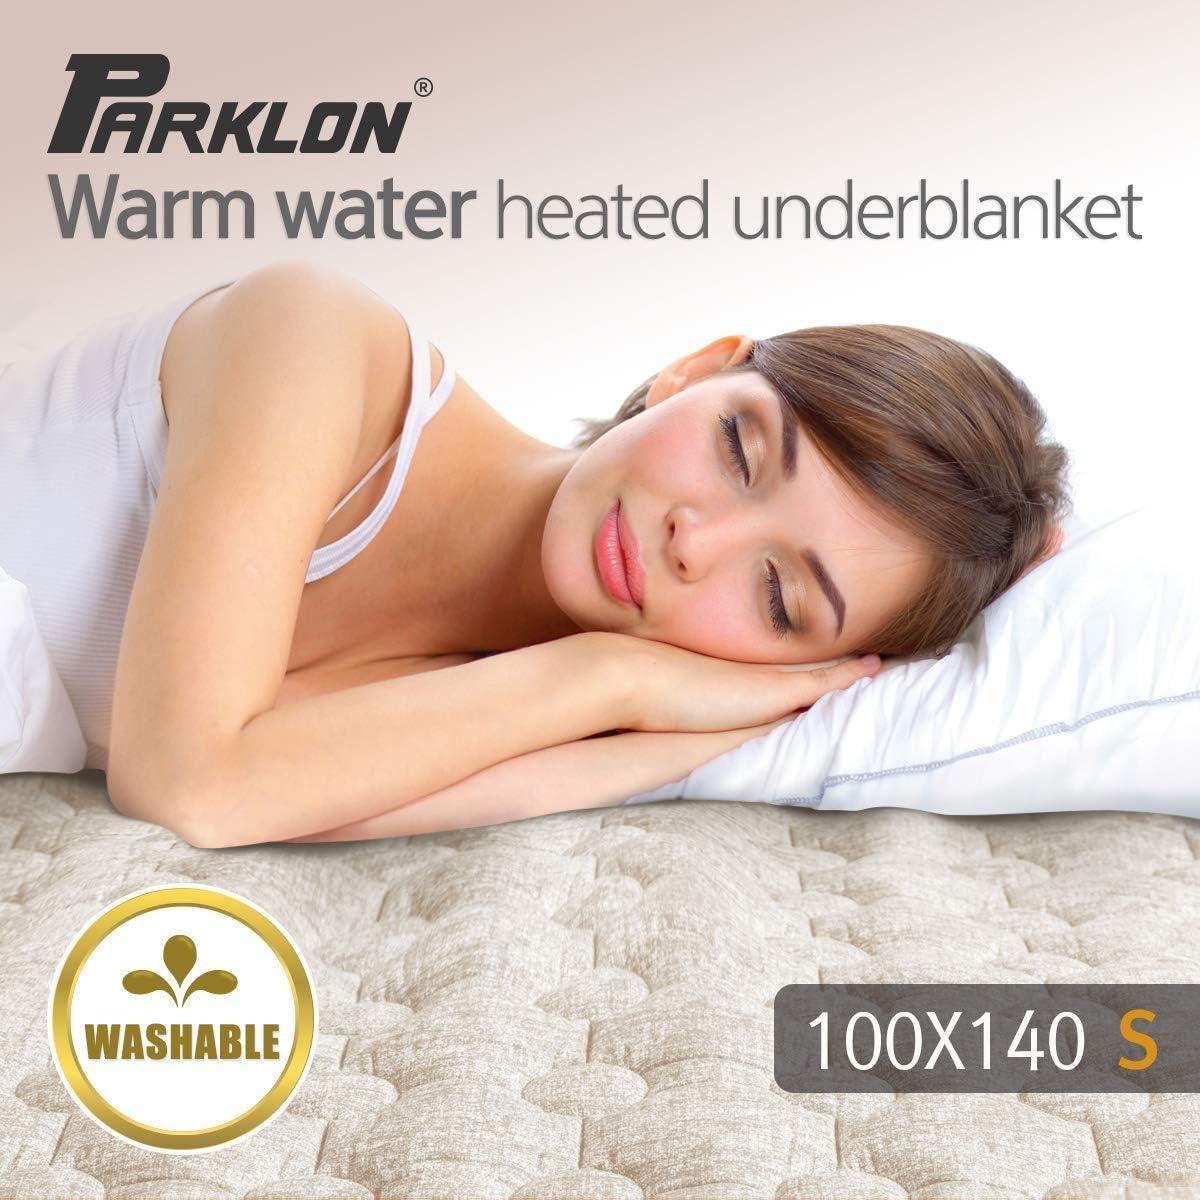 Parklon Washable Warm Water Heated Underblanket_Fabric Beige (Single)